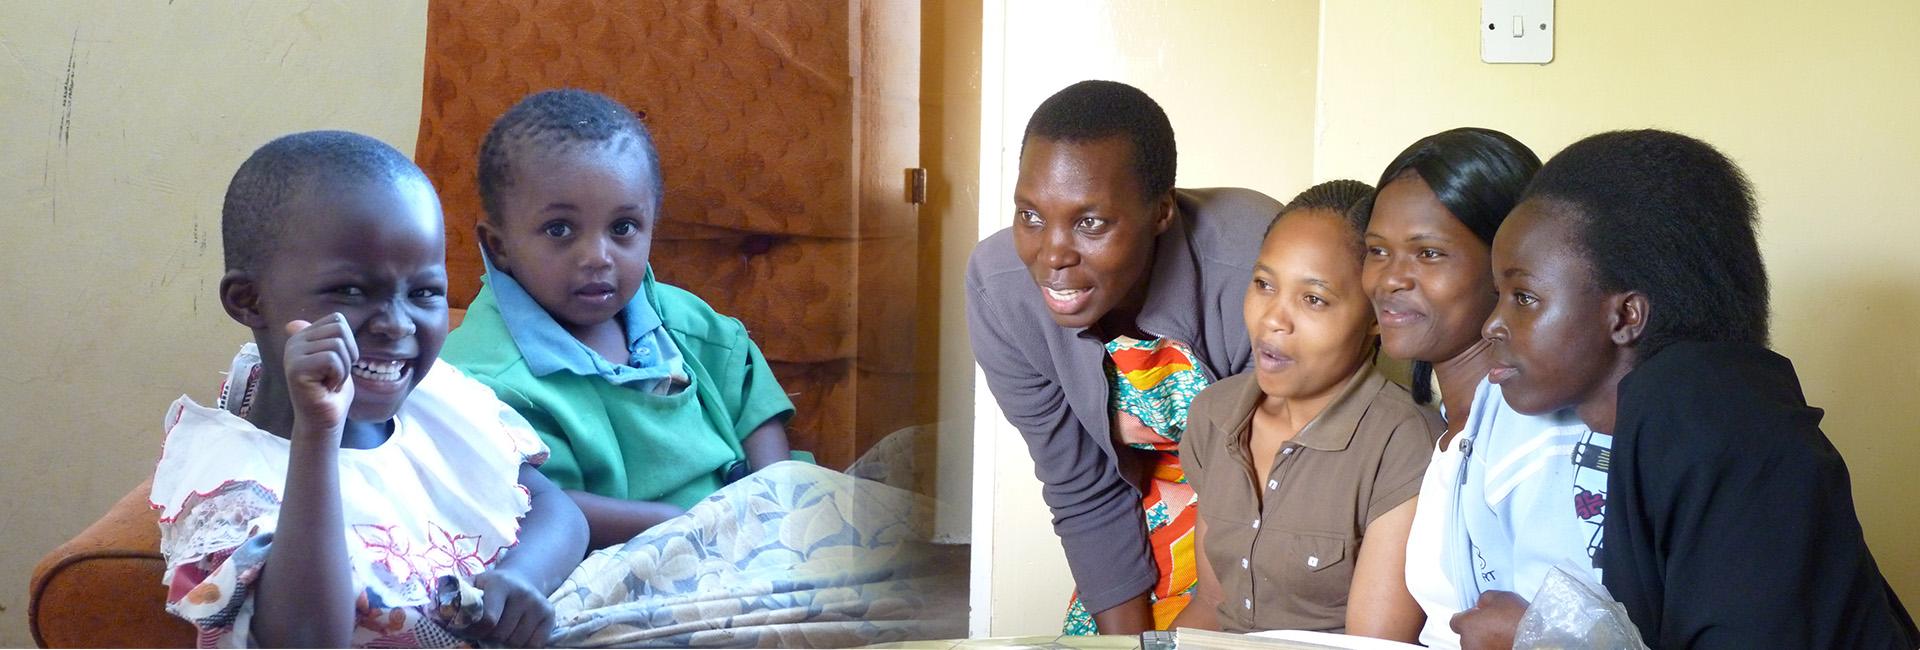 Denur Crafts Kenyan Jewelry And Crafts